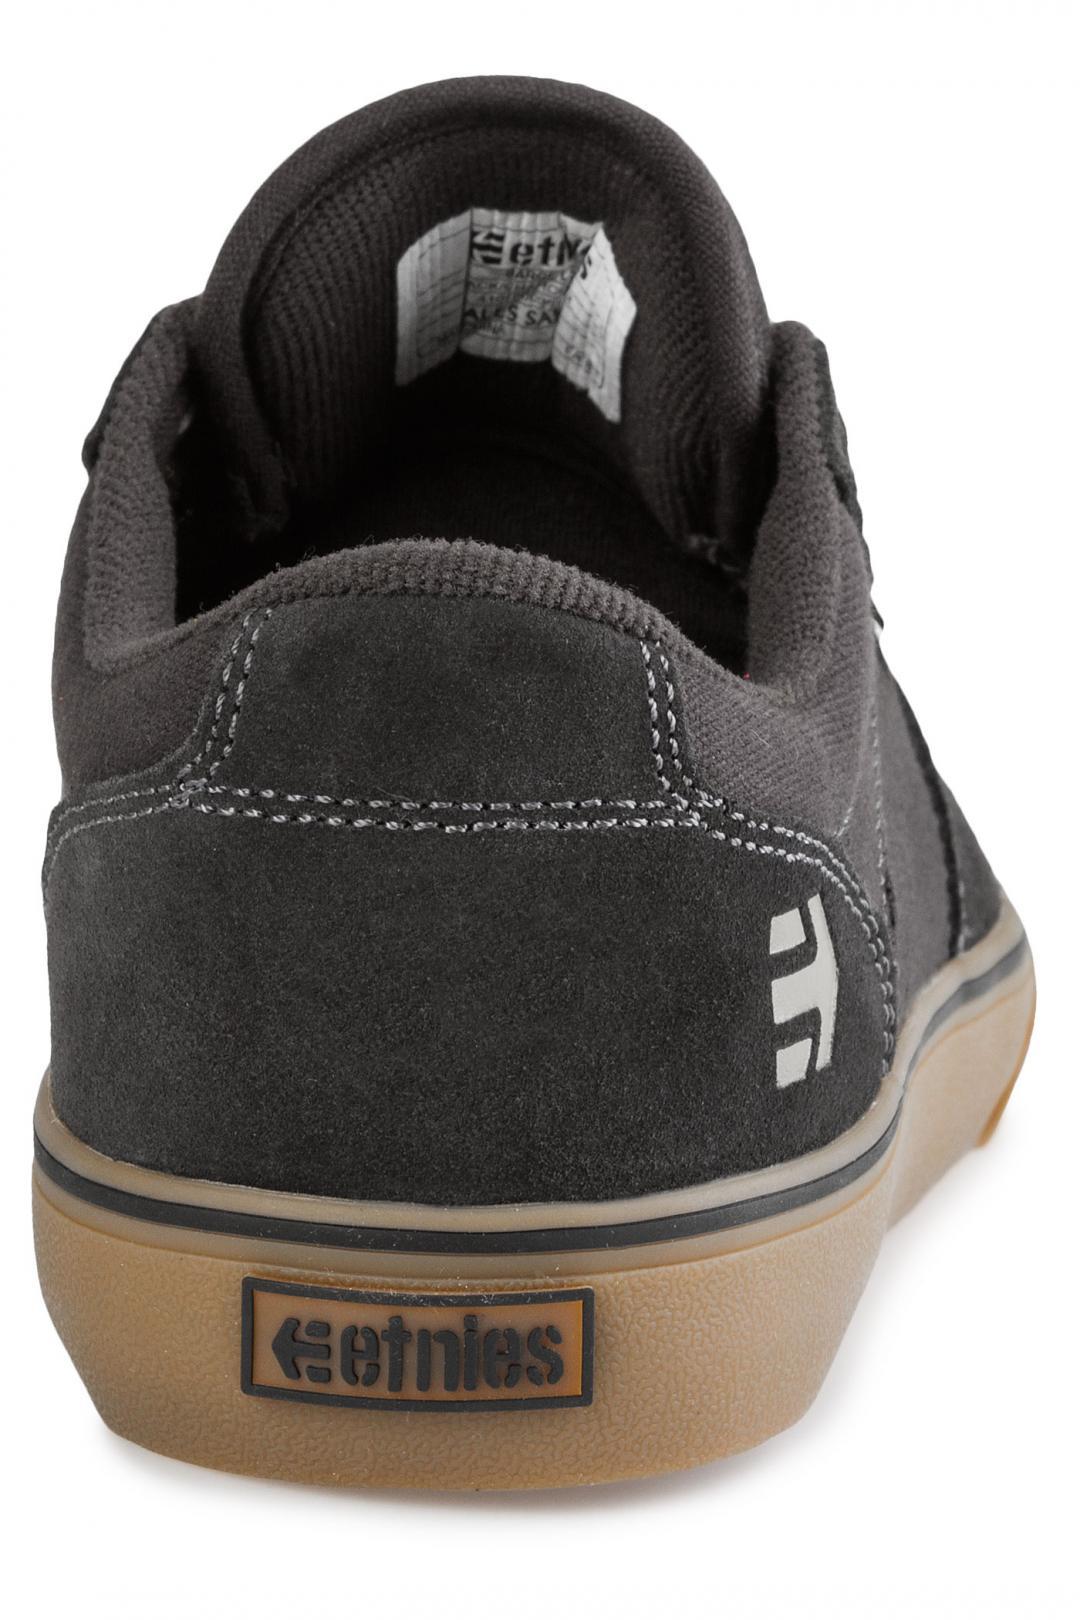 Uomo Etnies Barge LS black charcoal gum   Scarpe da skate